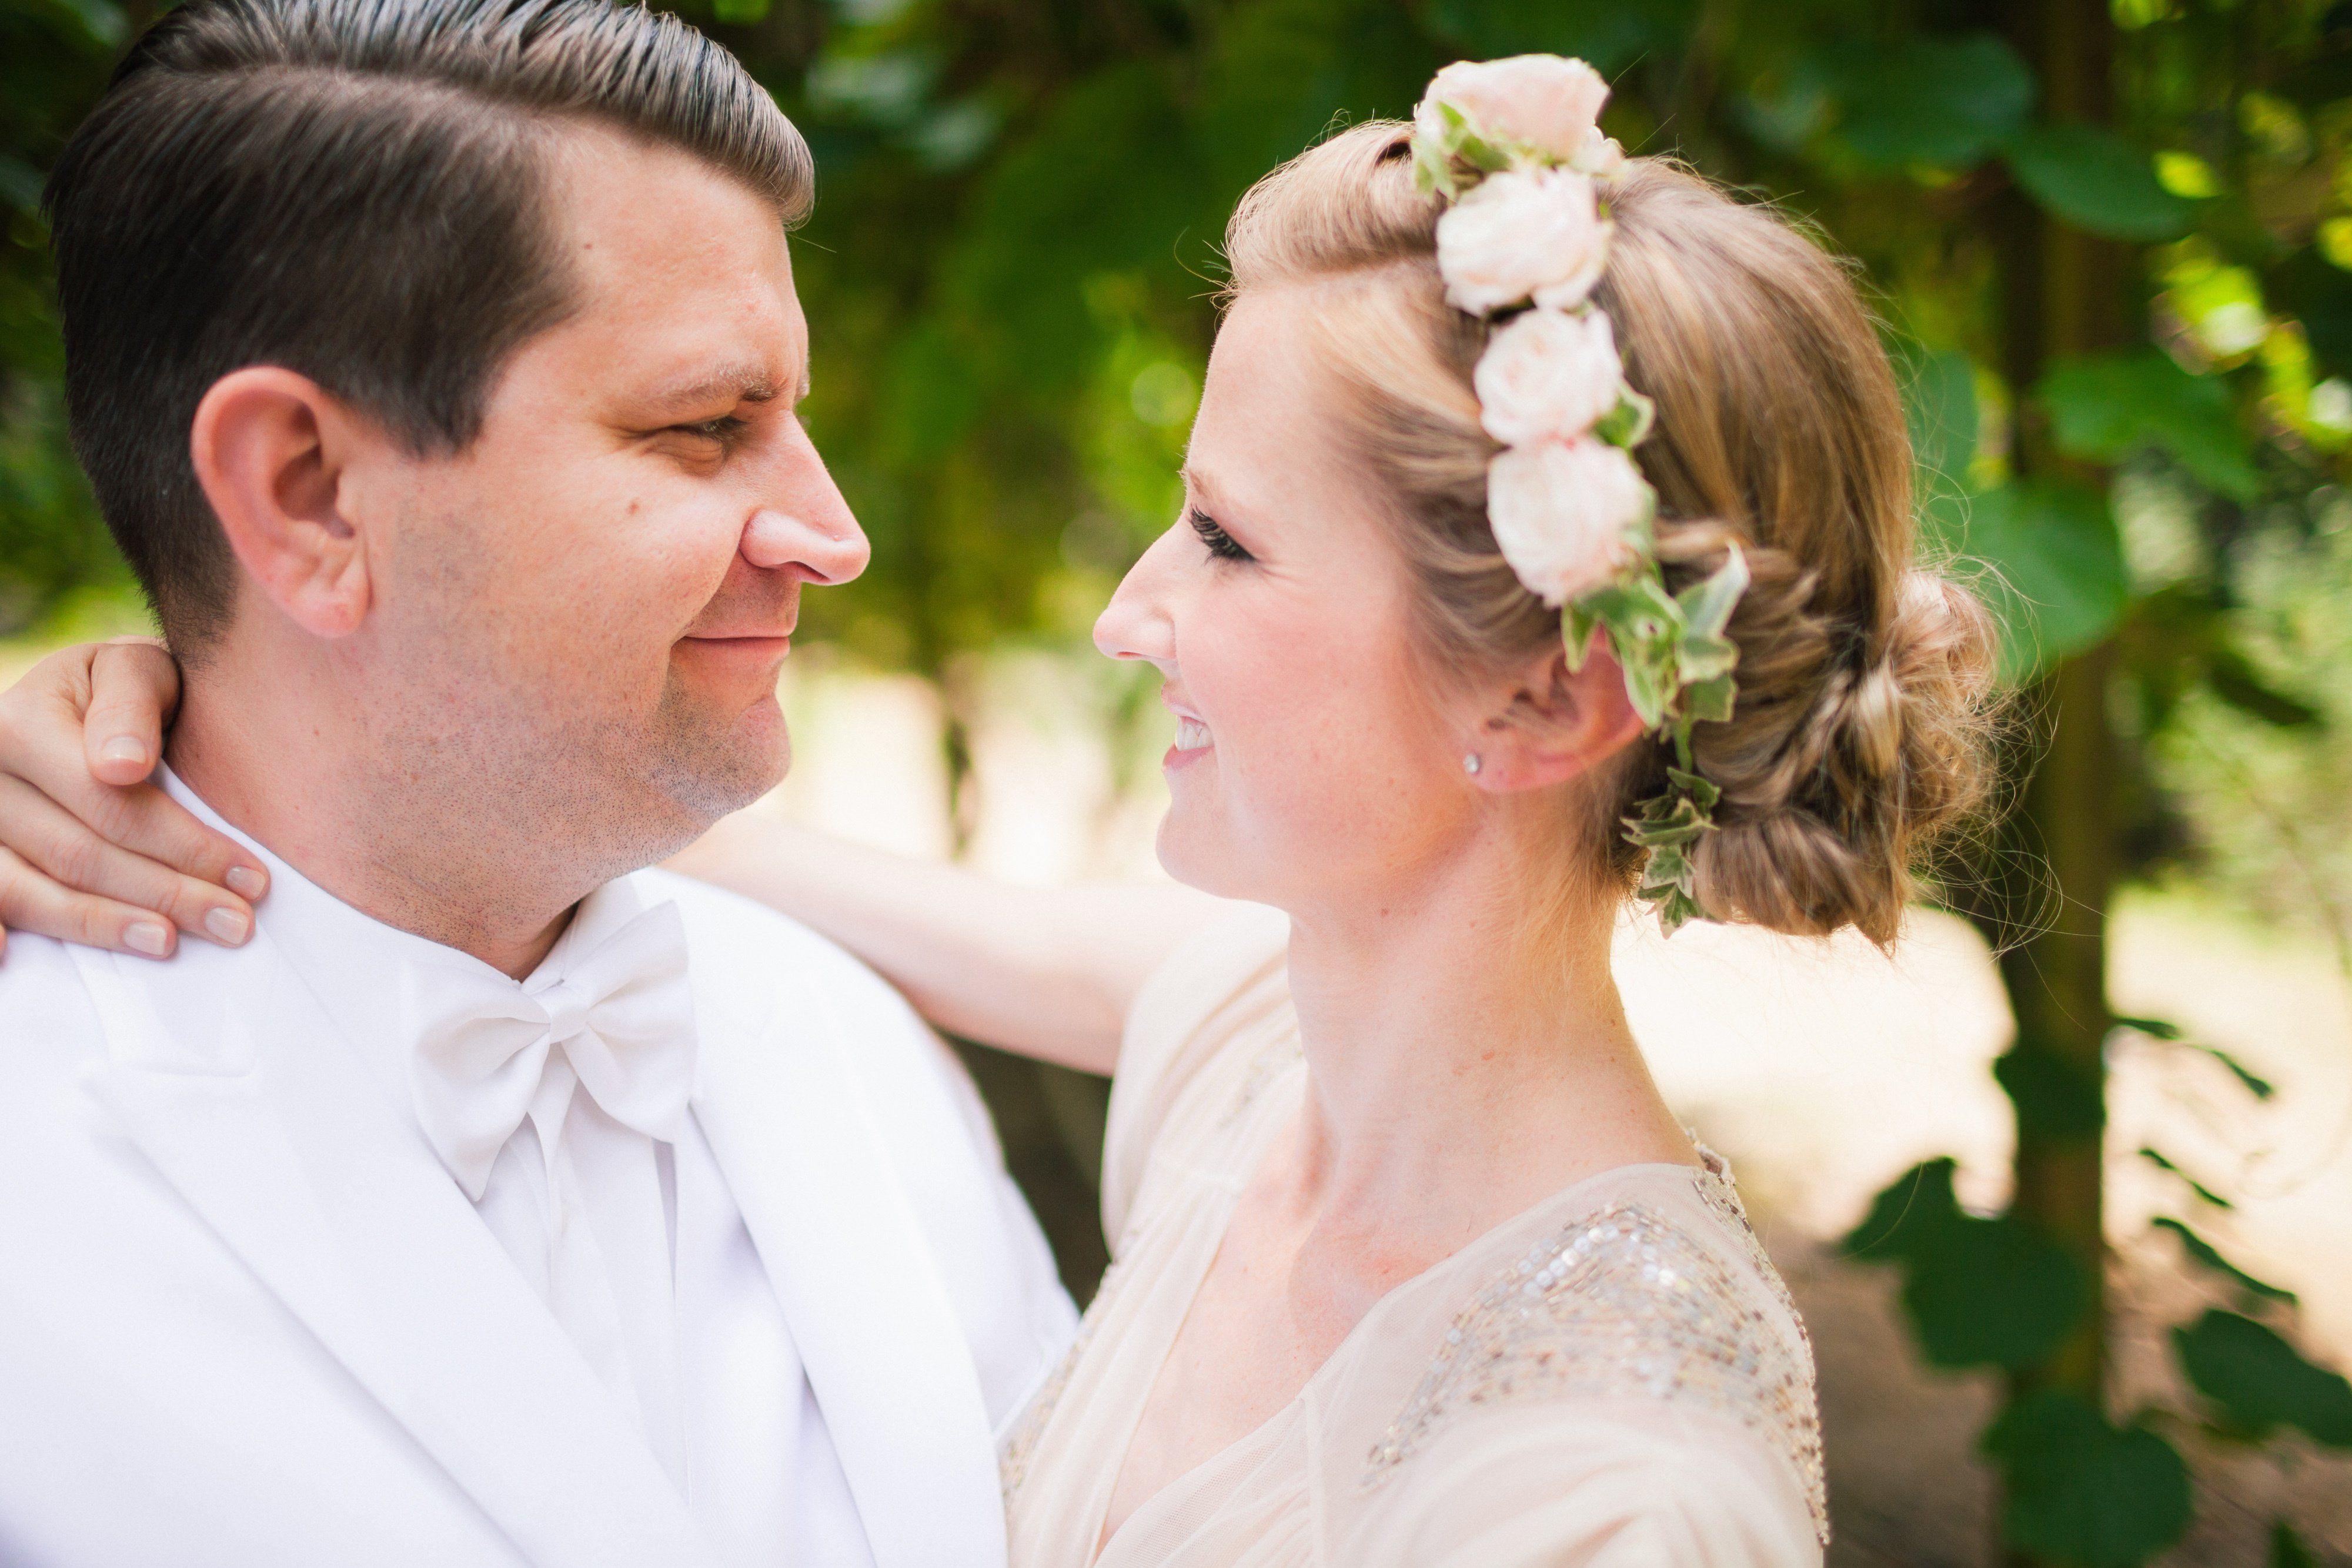 A Quirky, Bohemian Wedding at a Private Residence in Sebastopol, California